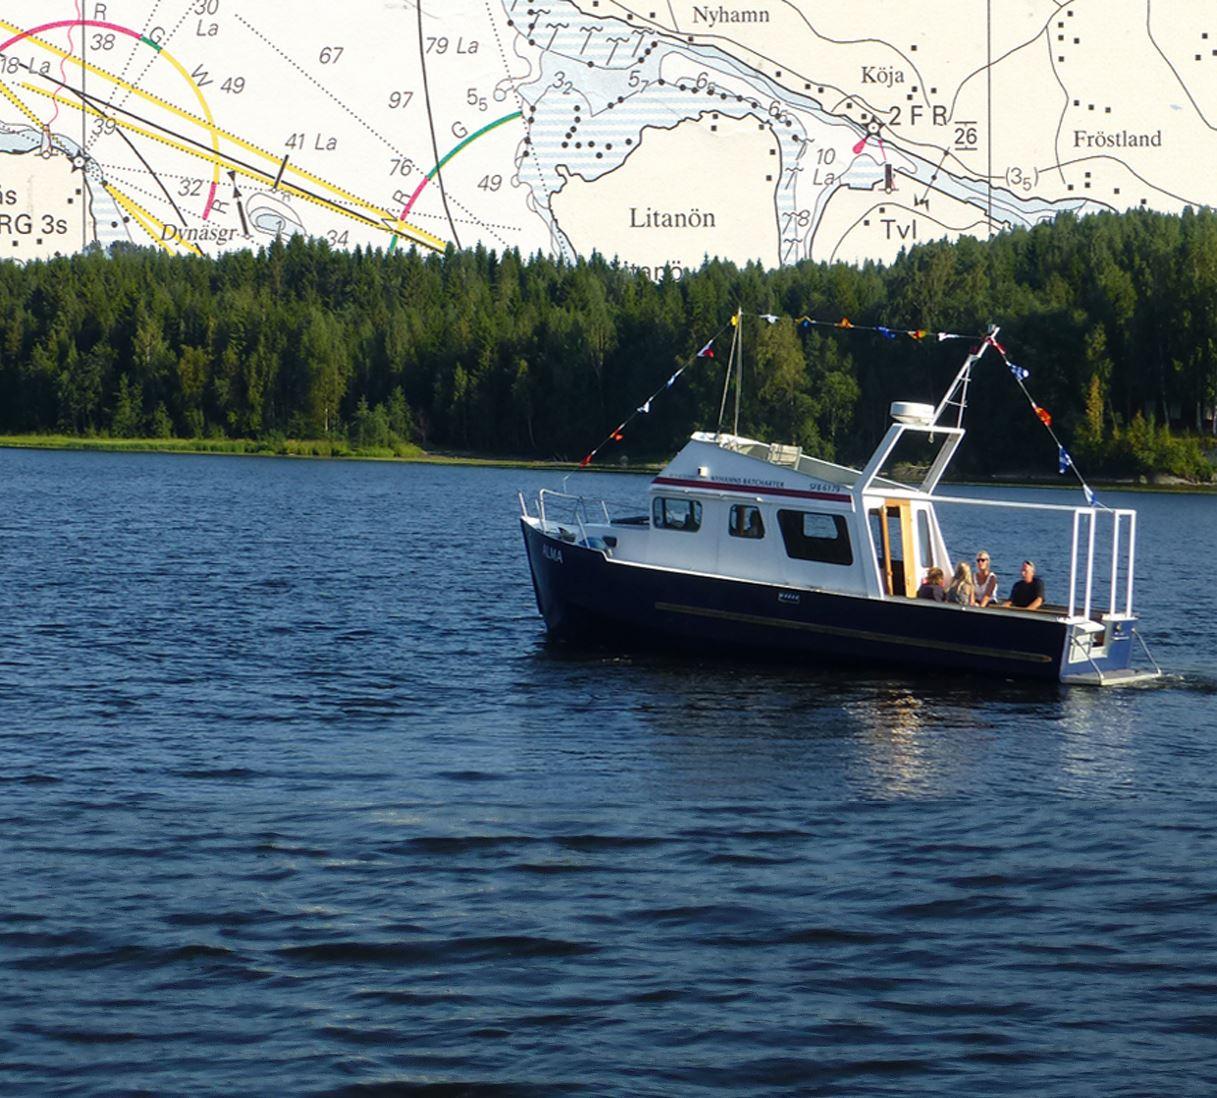 Nyhamns Båtcharter - Båten Alma